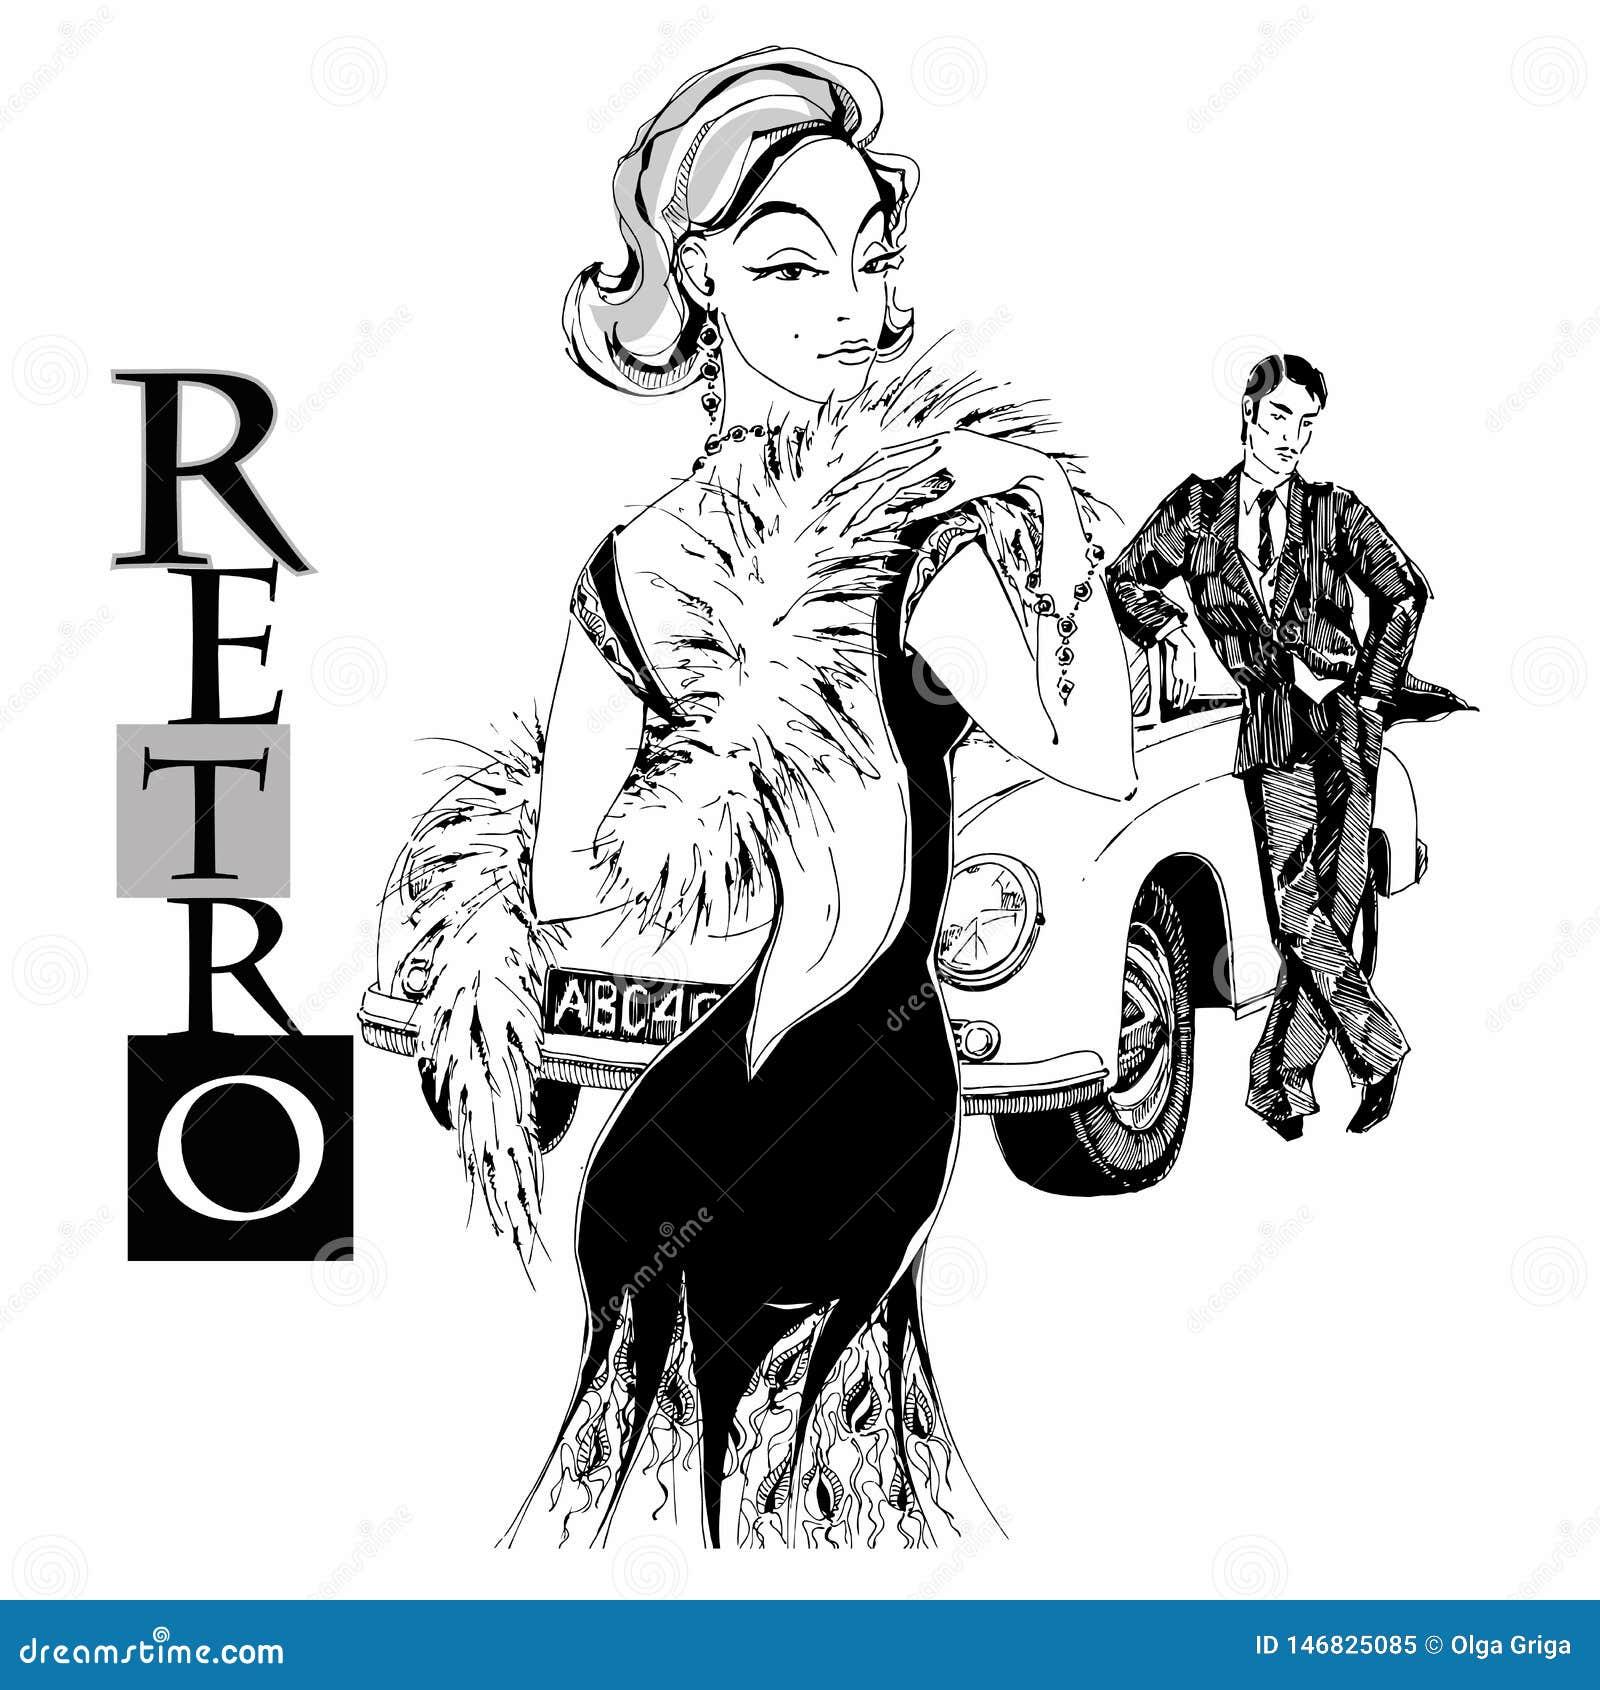 Elegancka dama i dżentelmen w retro stylu samoch?d grafit wektor